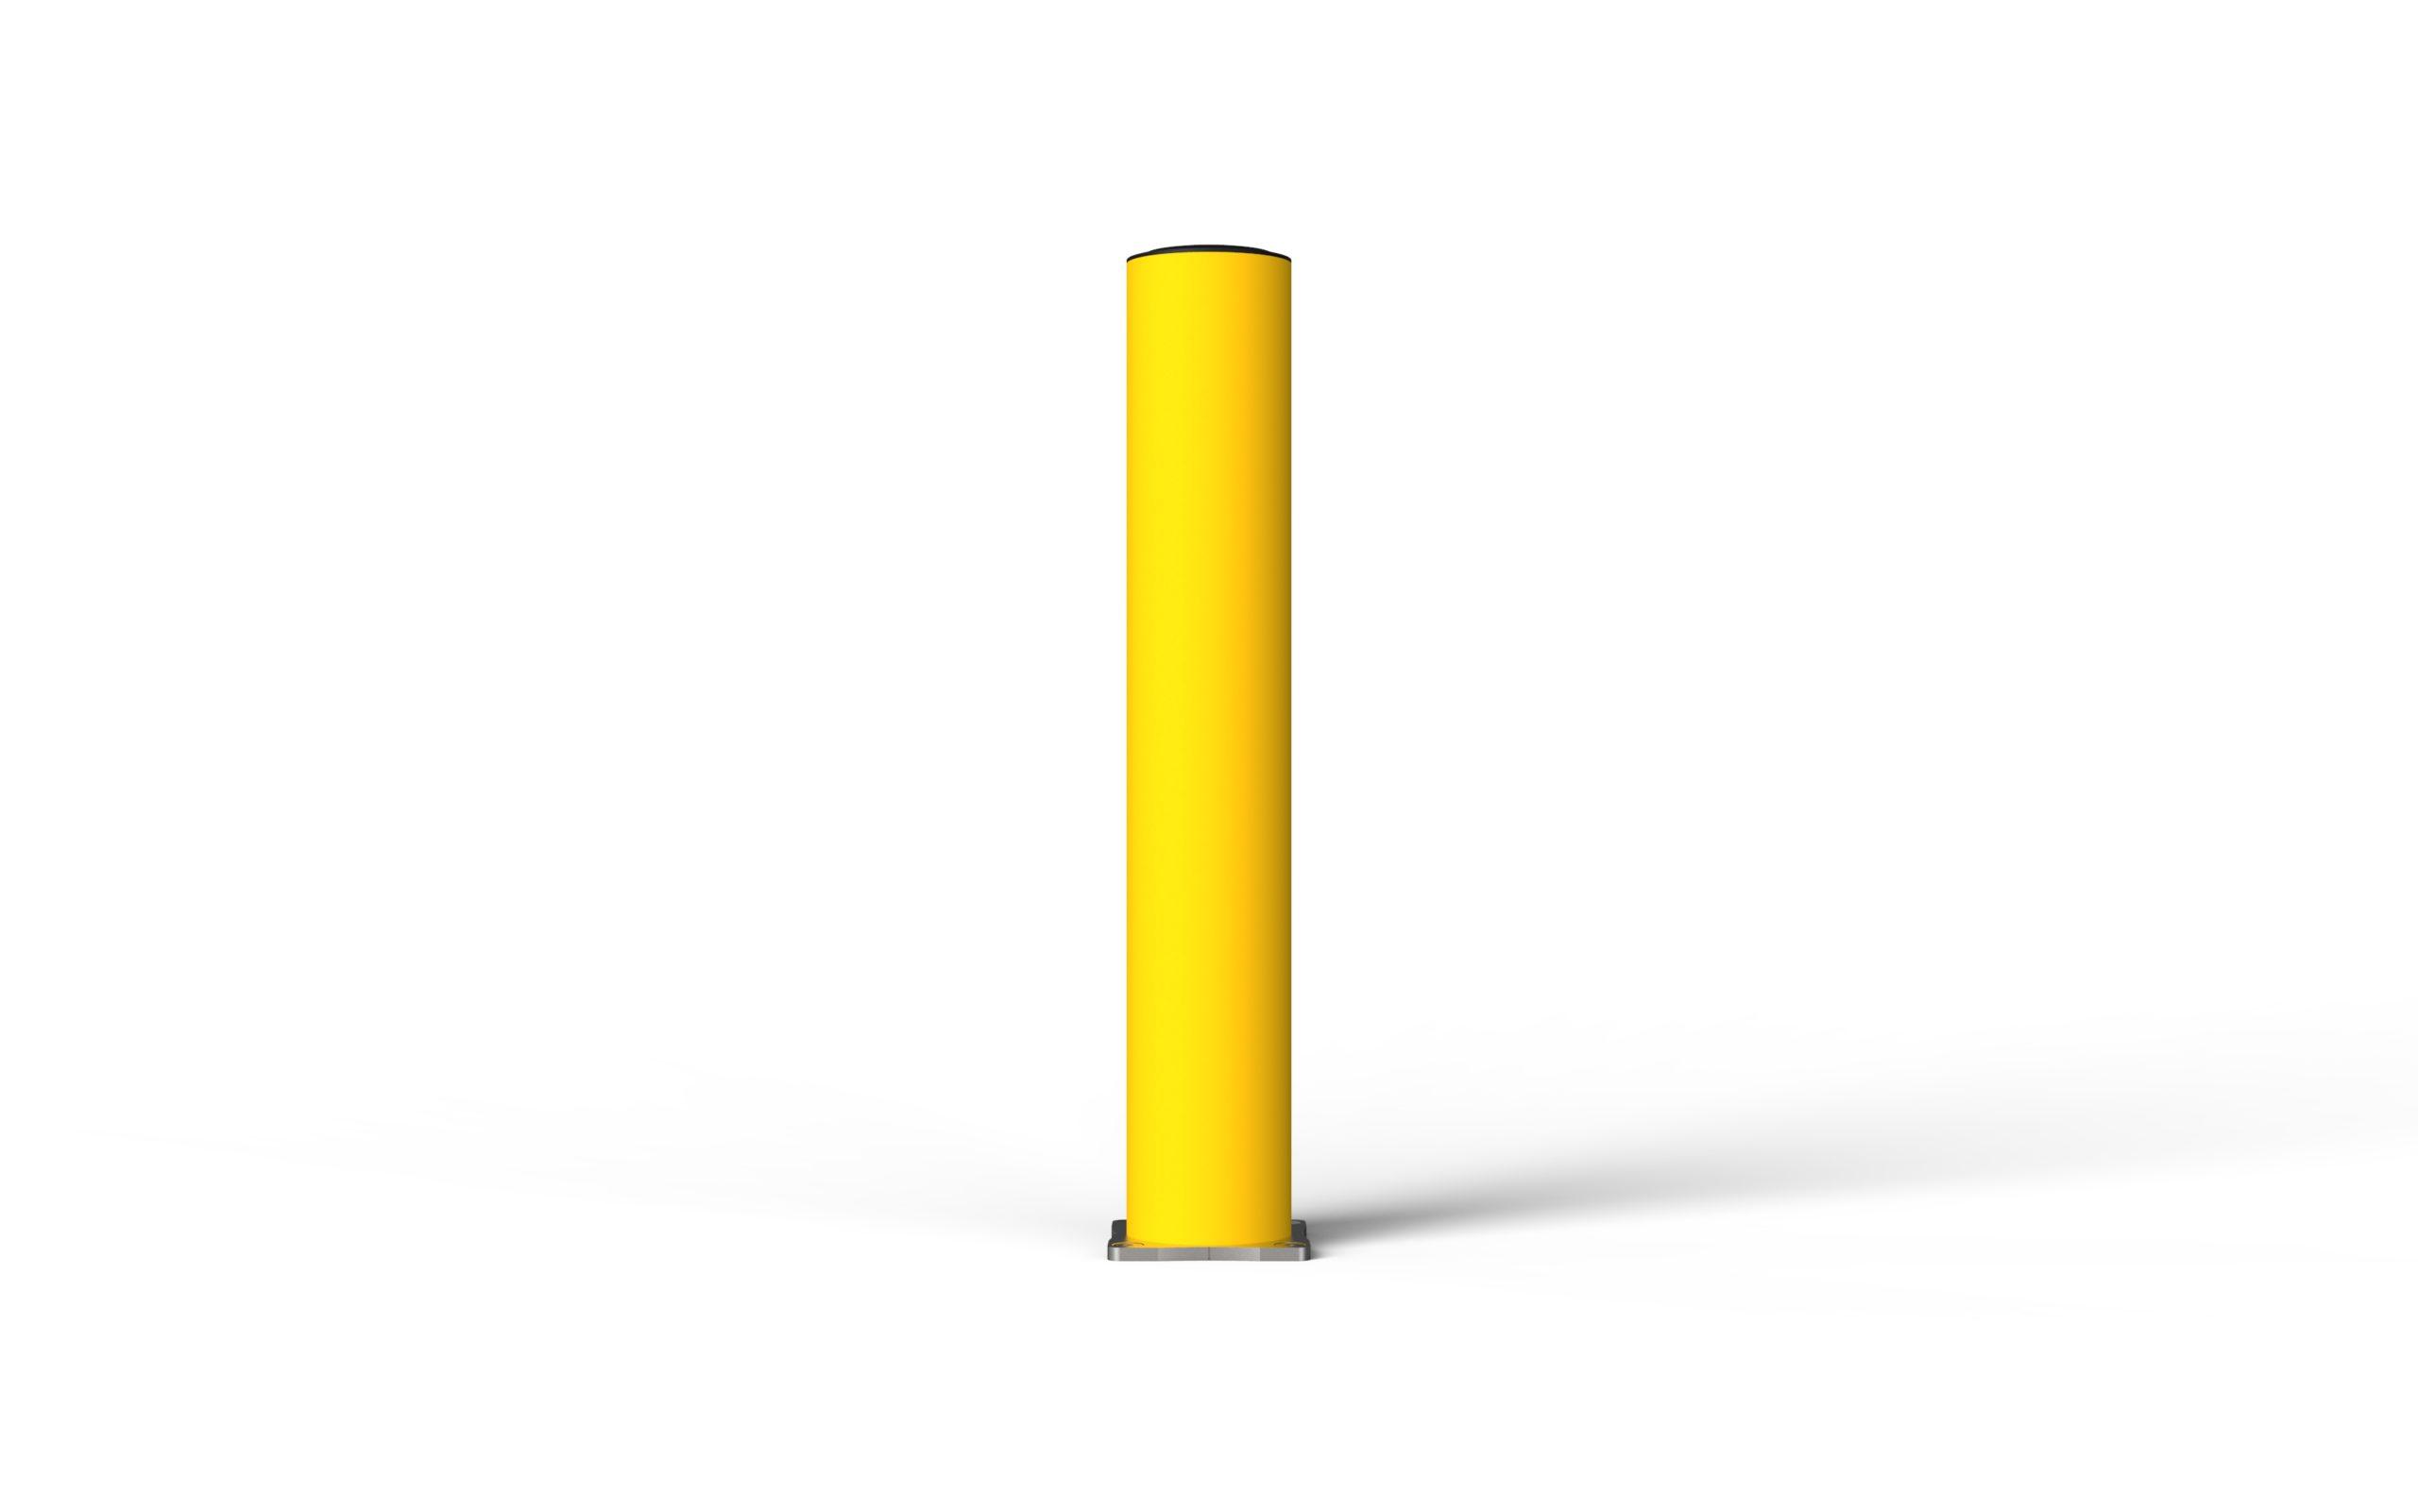 Schutzpoller boplan® BO Light Ø125 – Höhe 750 mm – gelb – Edelstahl Bodenplatte